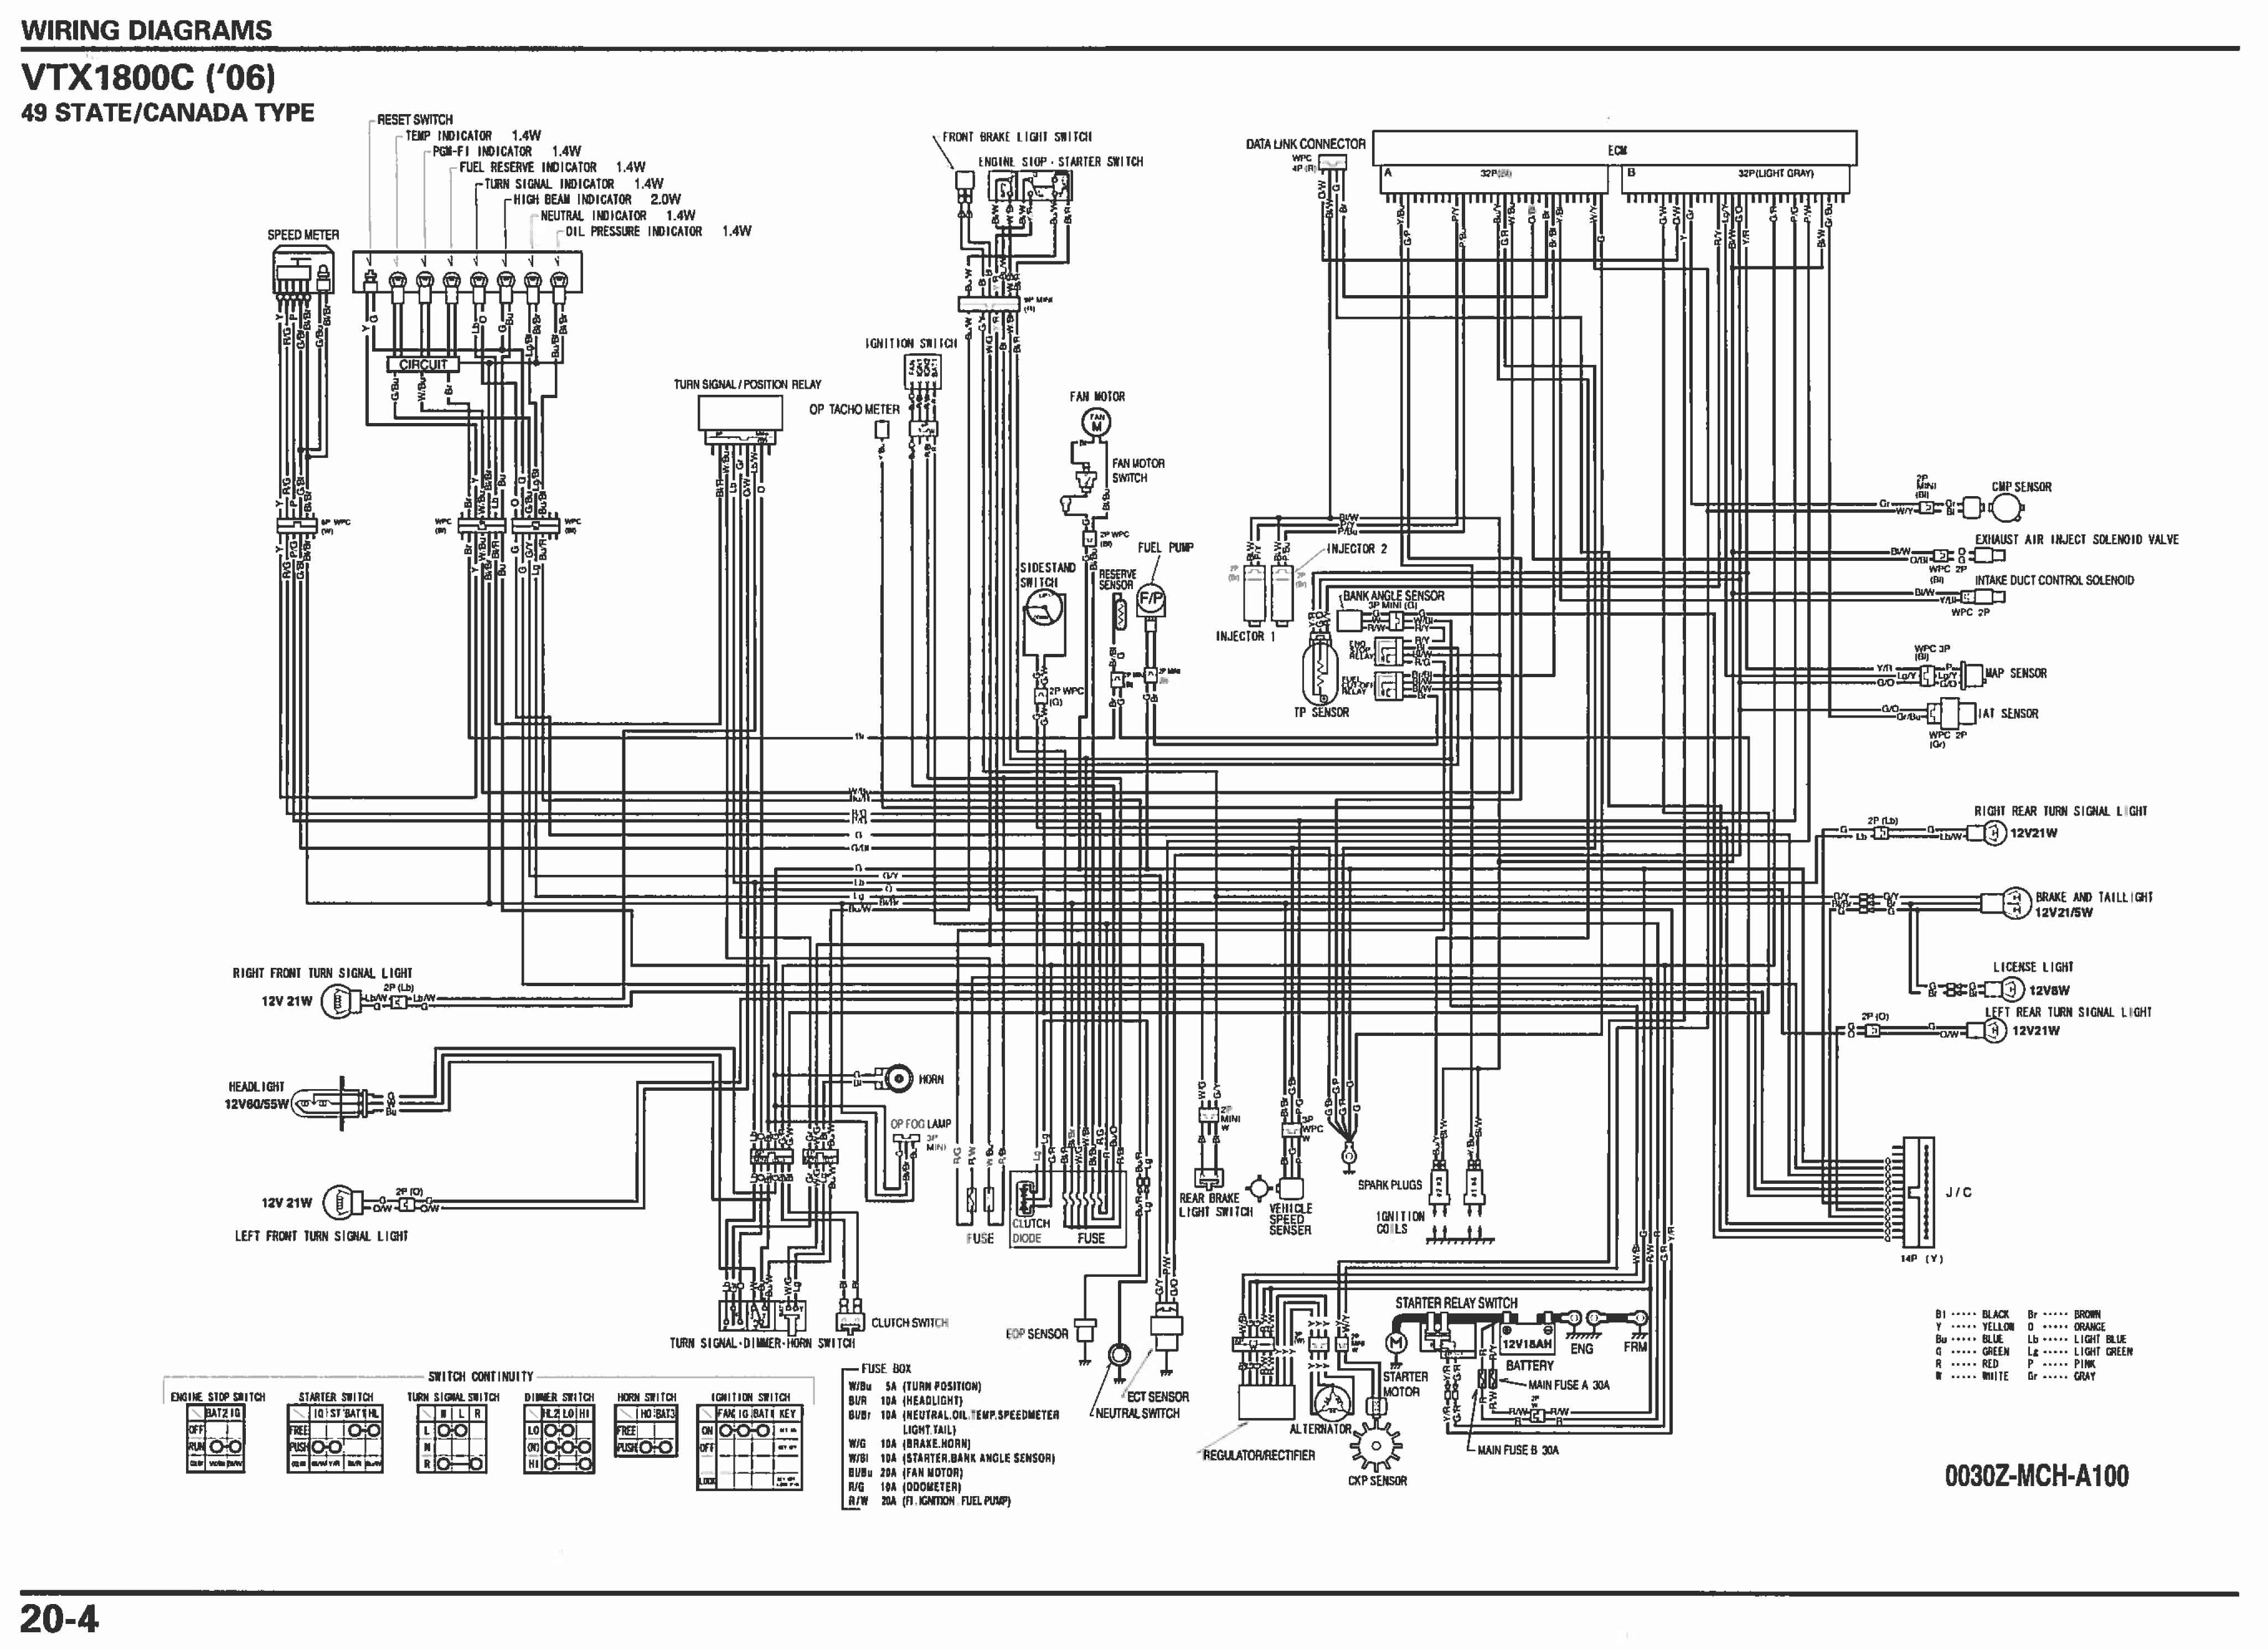 Maxxforce 13 Engine Sensor Harness Diagram Wiring Diagram] Vtx 1300 Wiring Diagram Turn Signal Hd Of Maxxforce 13 Engine Sensor Harness Diagram